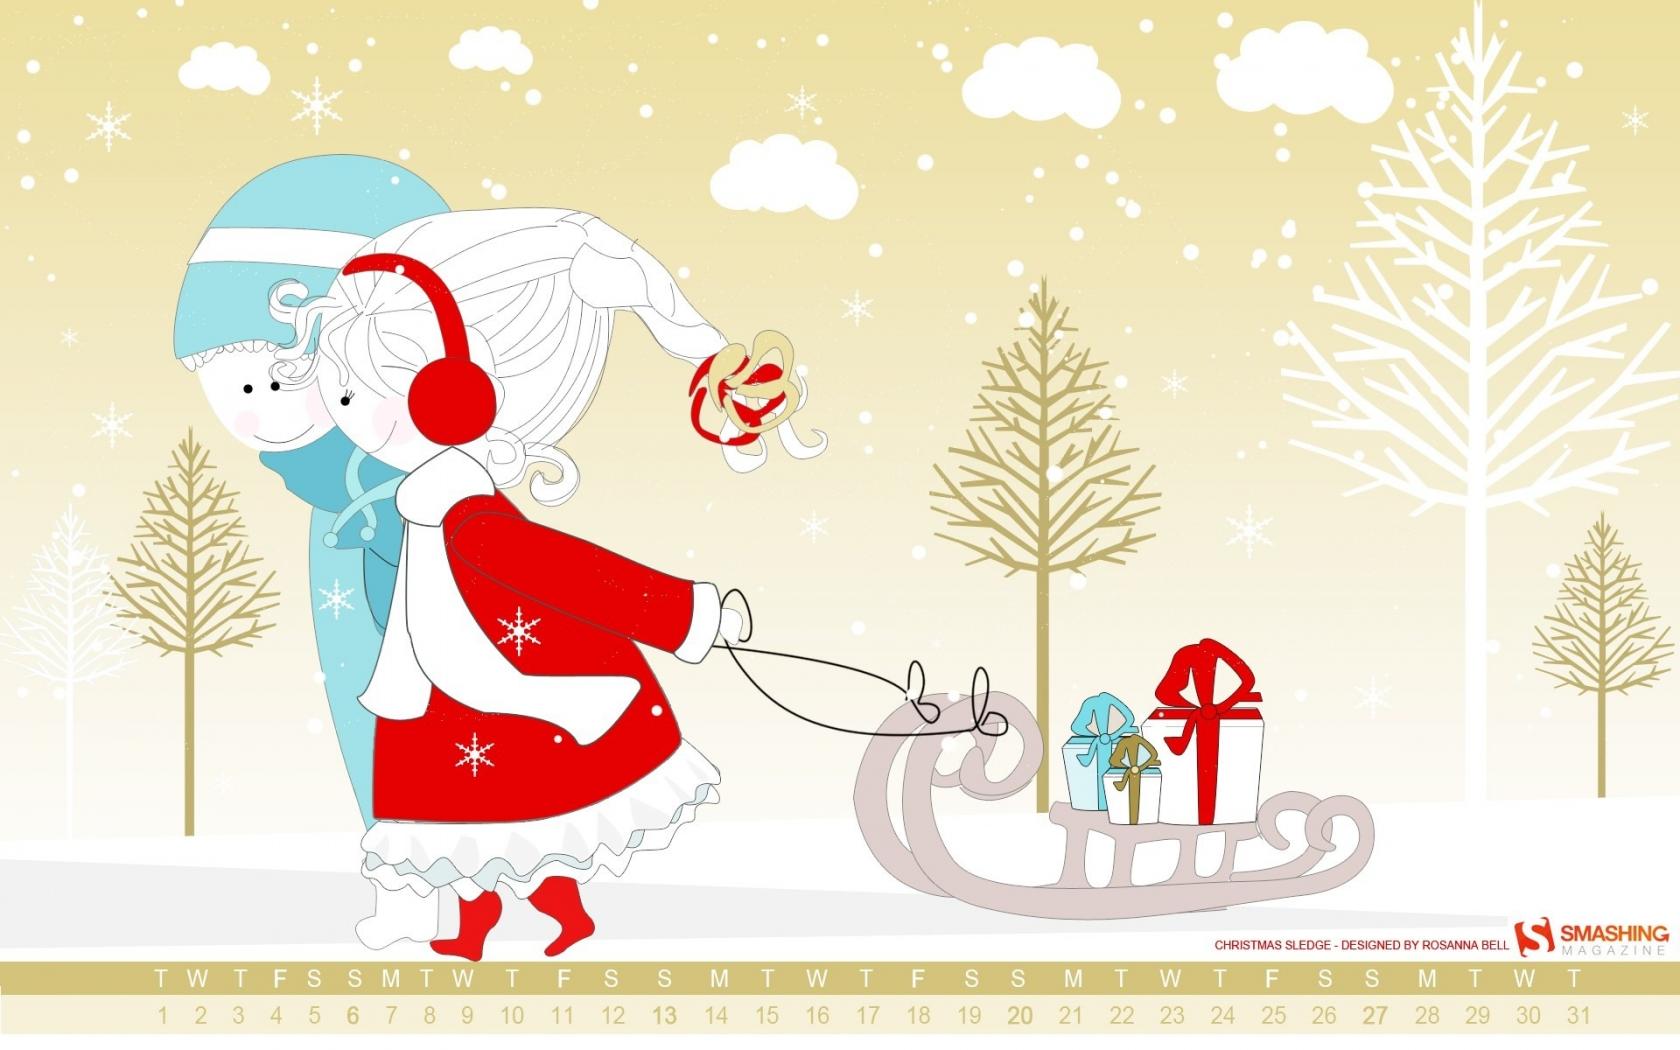 Dibujos navidad para niños - 1680x1050